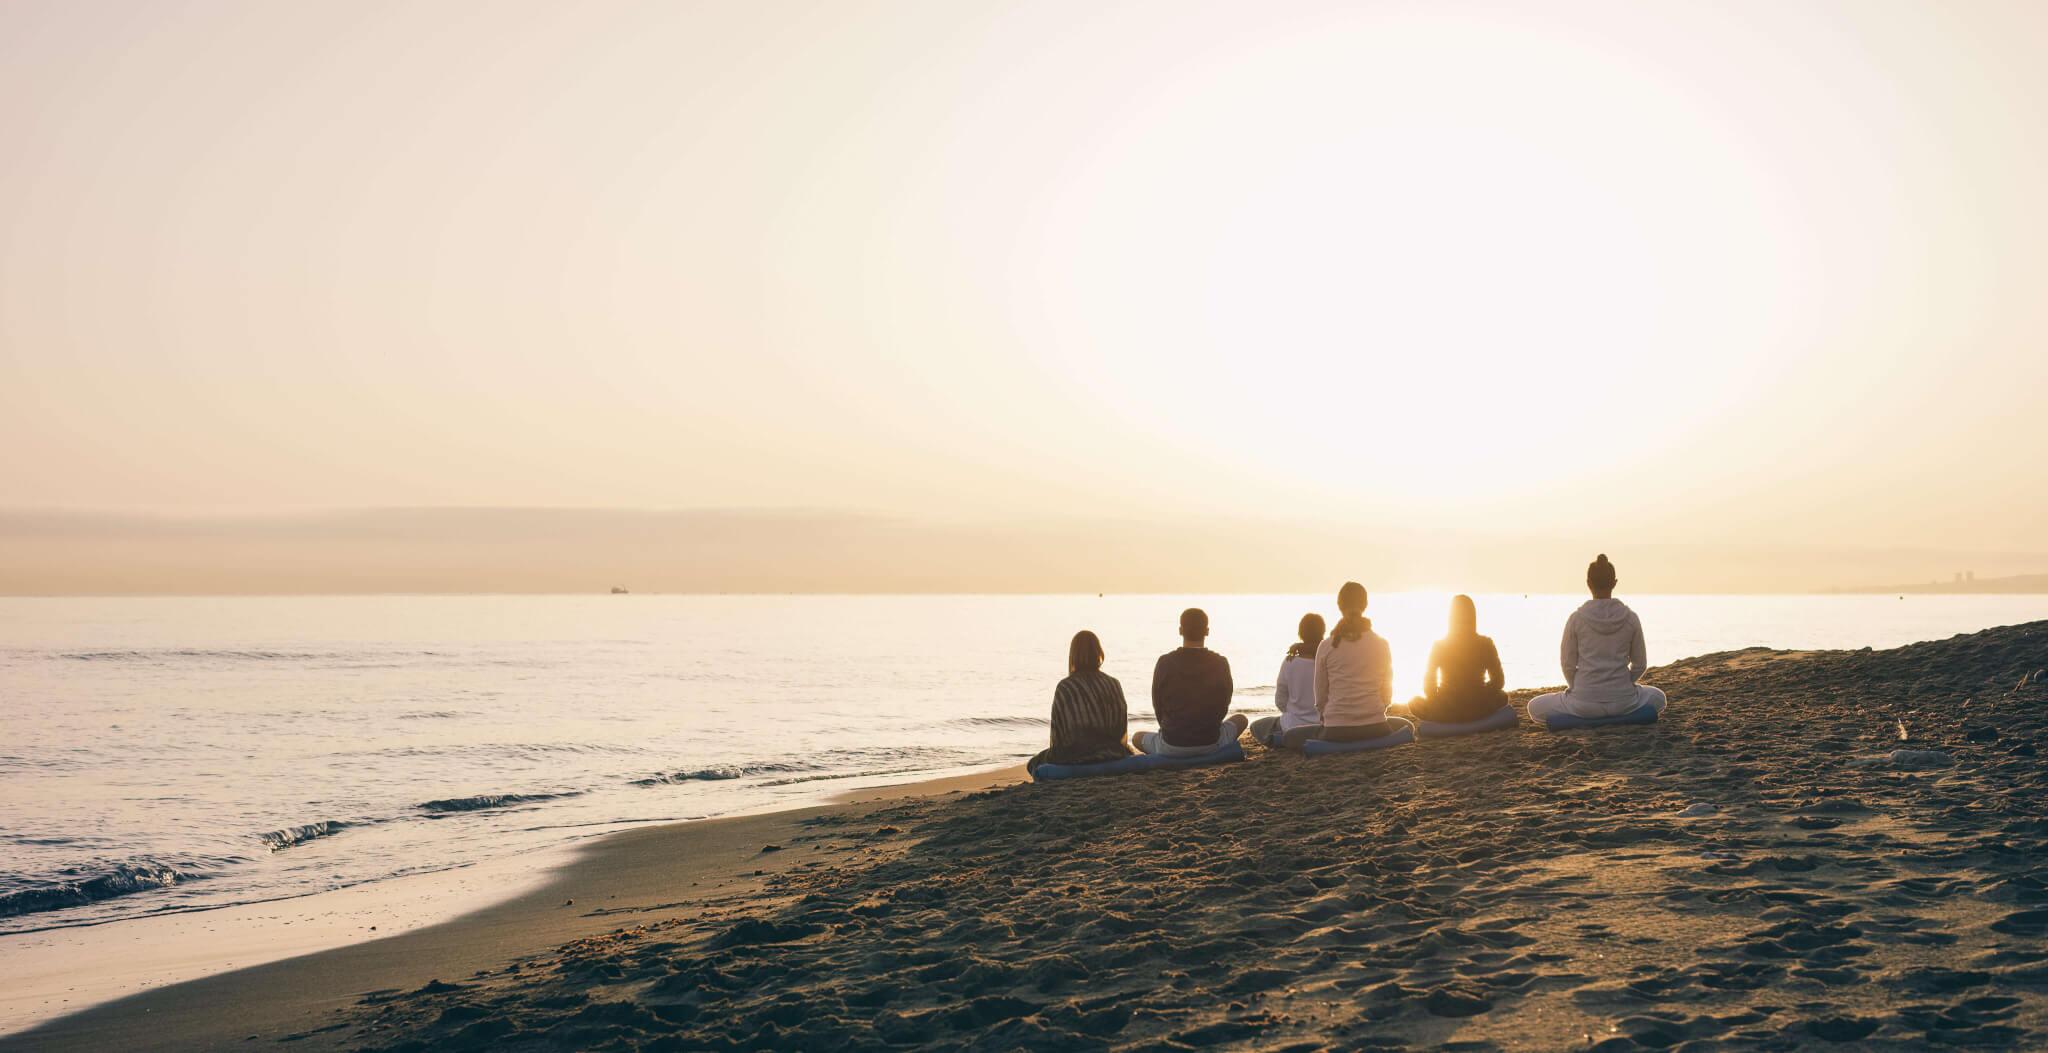 Buchinger Wilhelmi, Fasten, Heilfasten, Fasting, Health, Integrative Medicine, Zen Marbella, Meditation, Andalusia, Beach, Sea, Ocean, Sunset